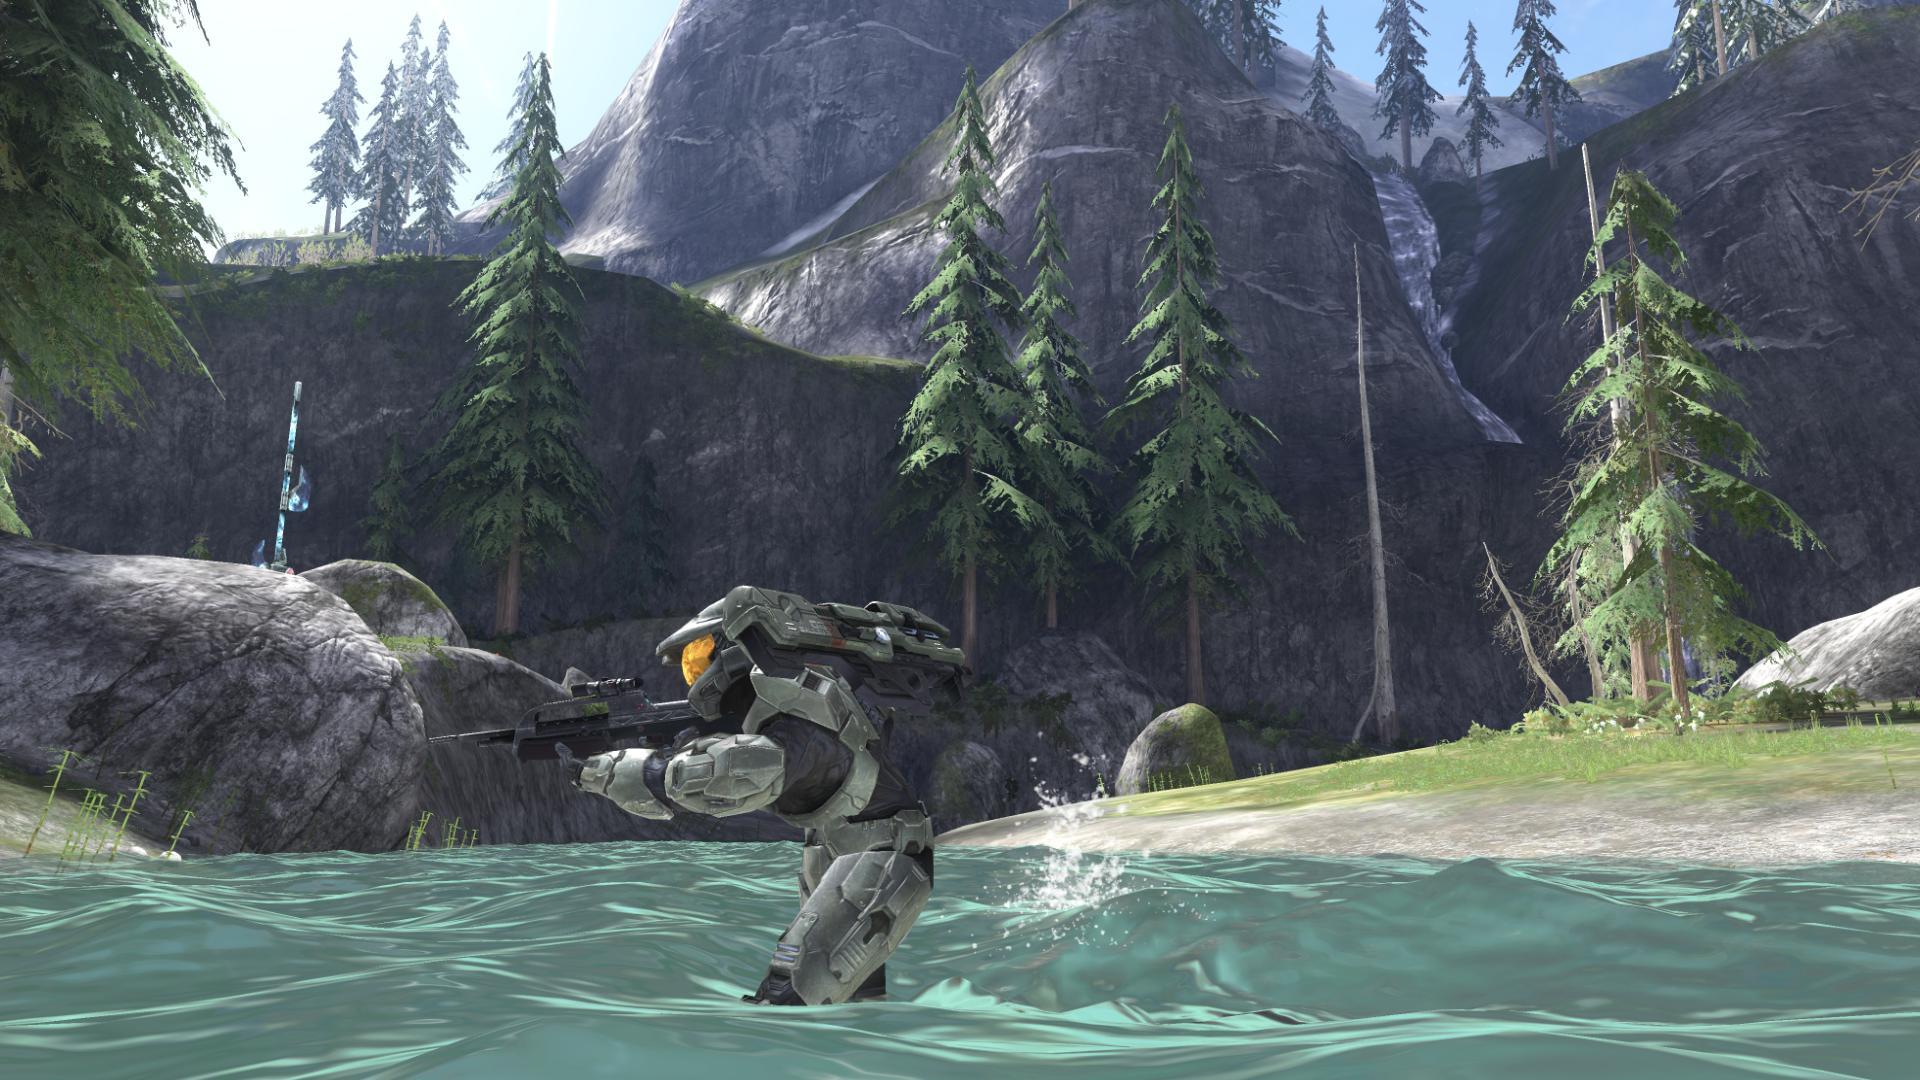 1523557164 9c0f85d8ec o Halo 3: Landscape + Water